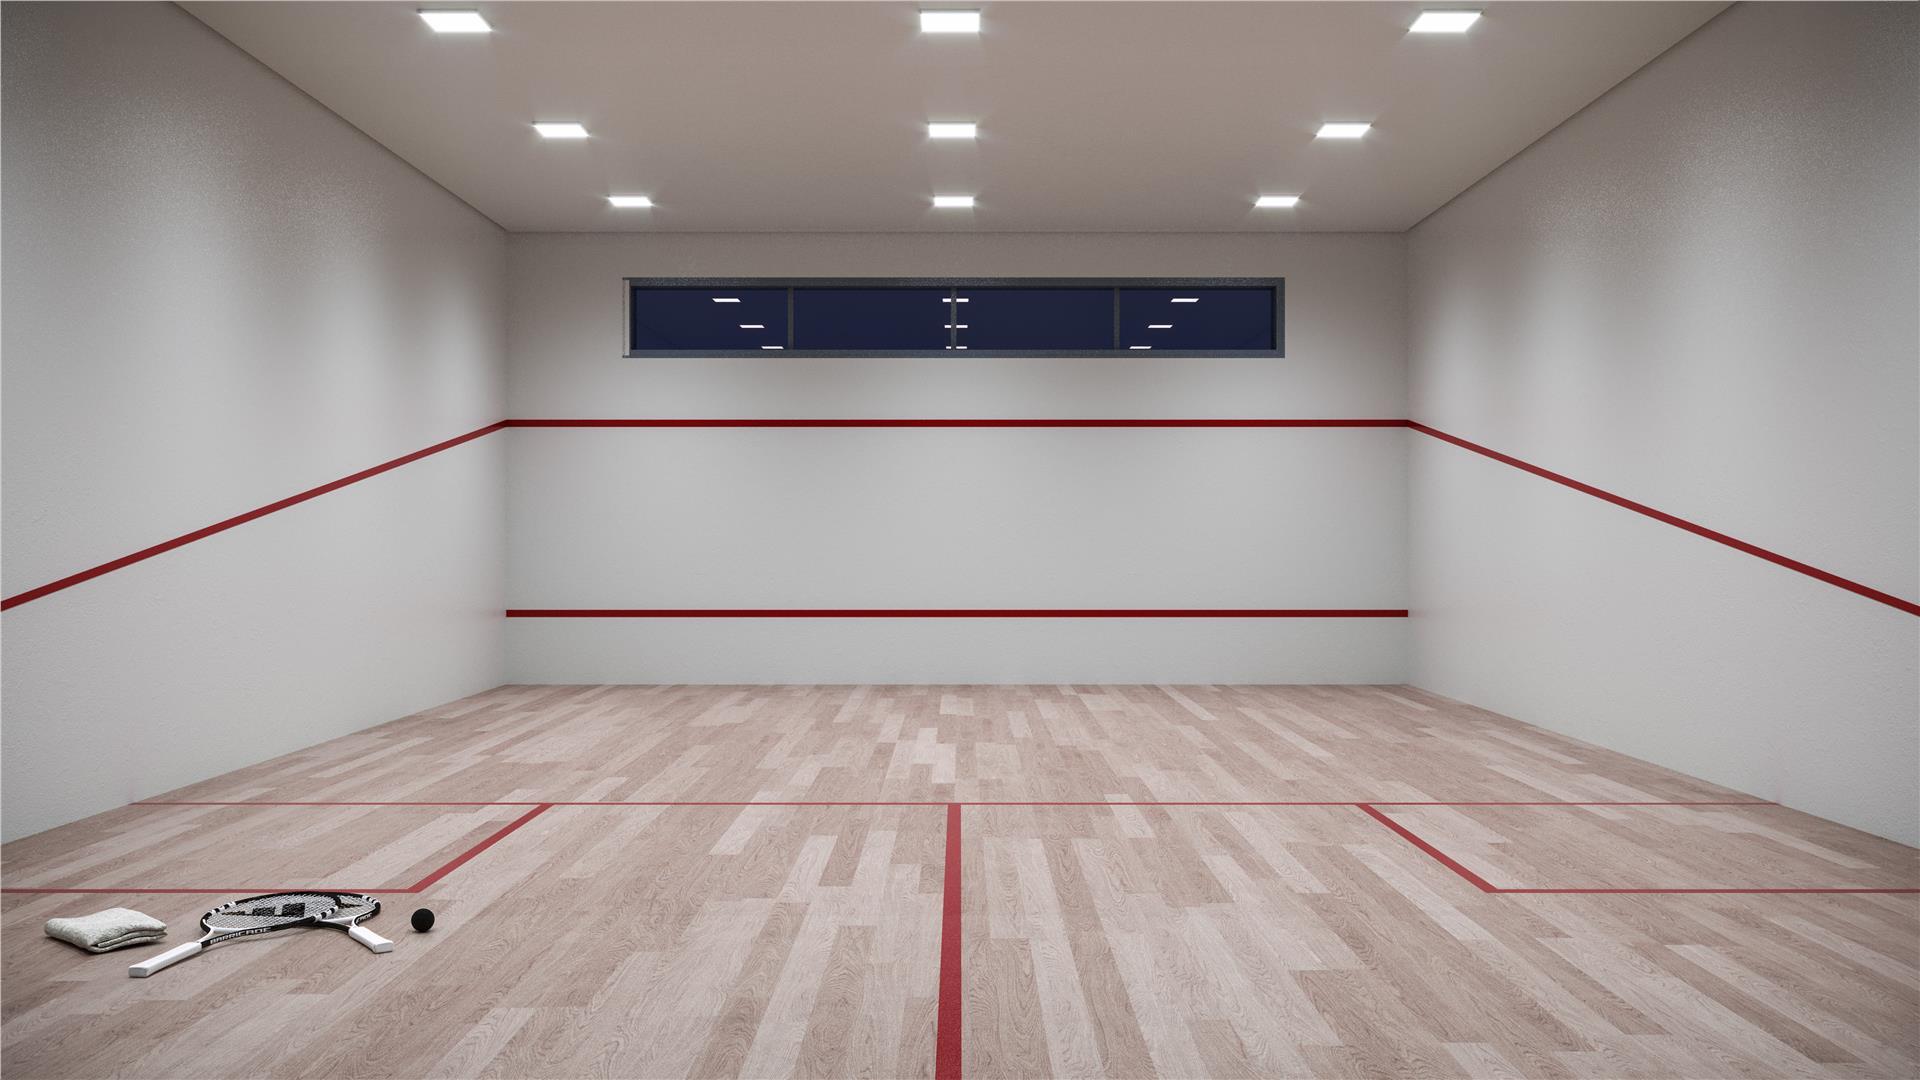 17-Tecnoart-Squash-R01-HR.jpg